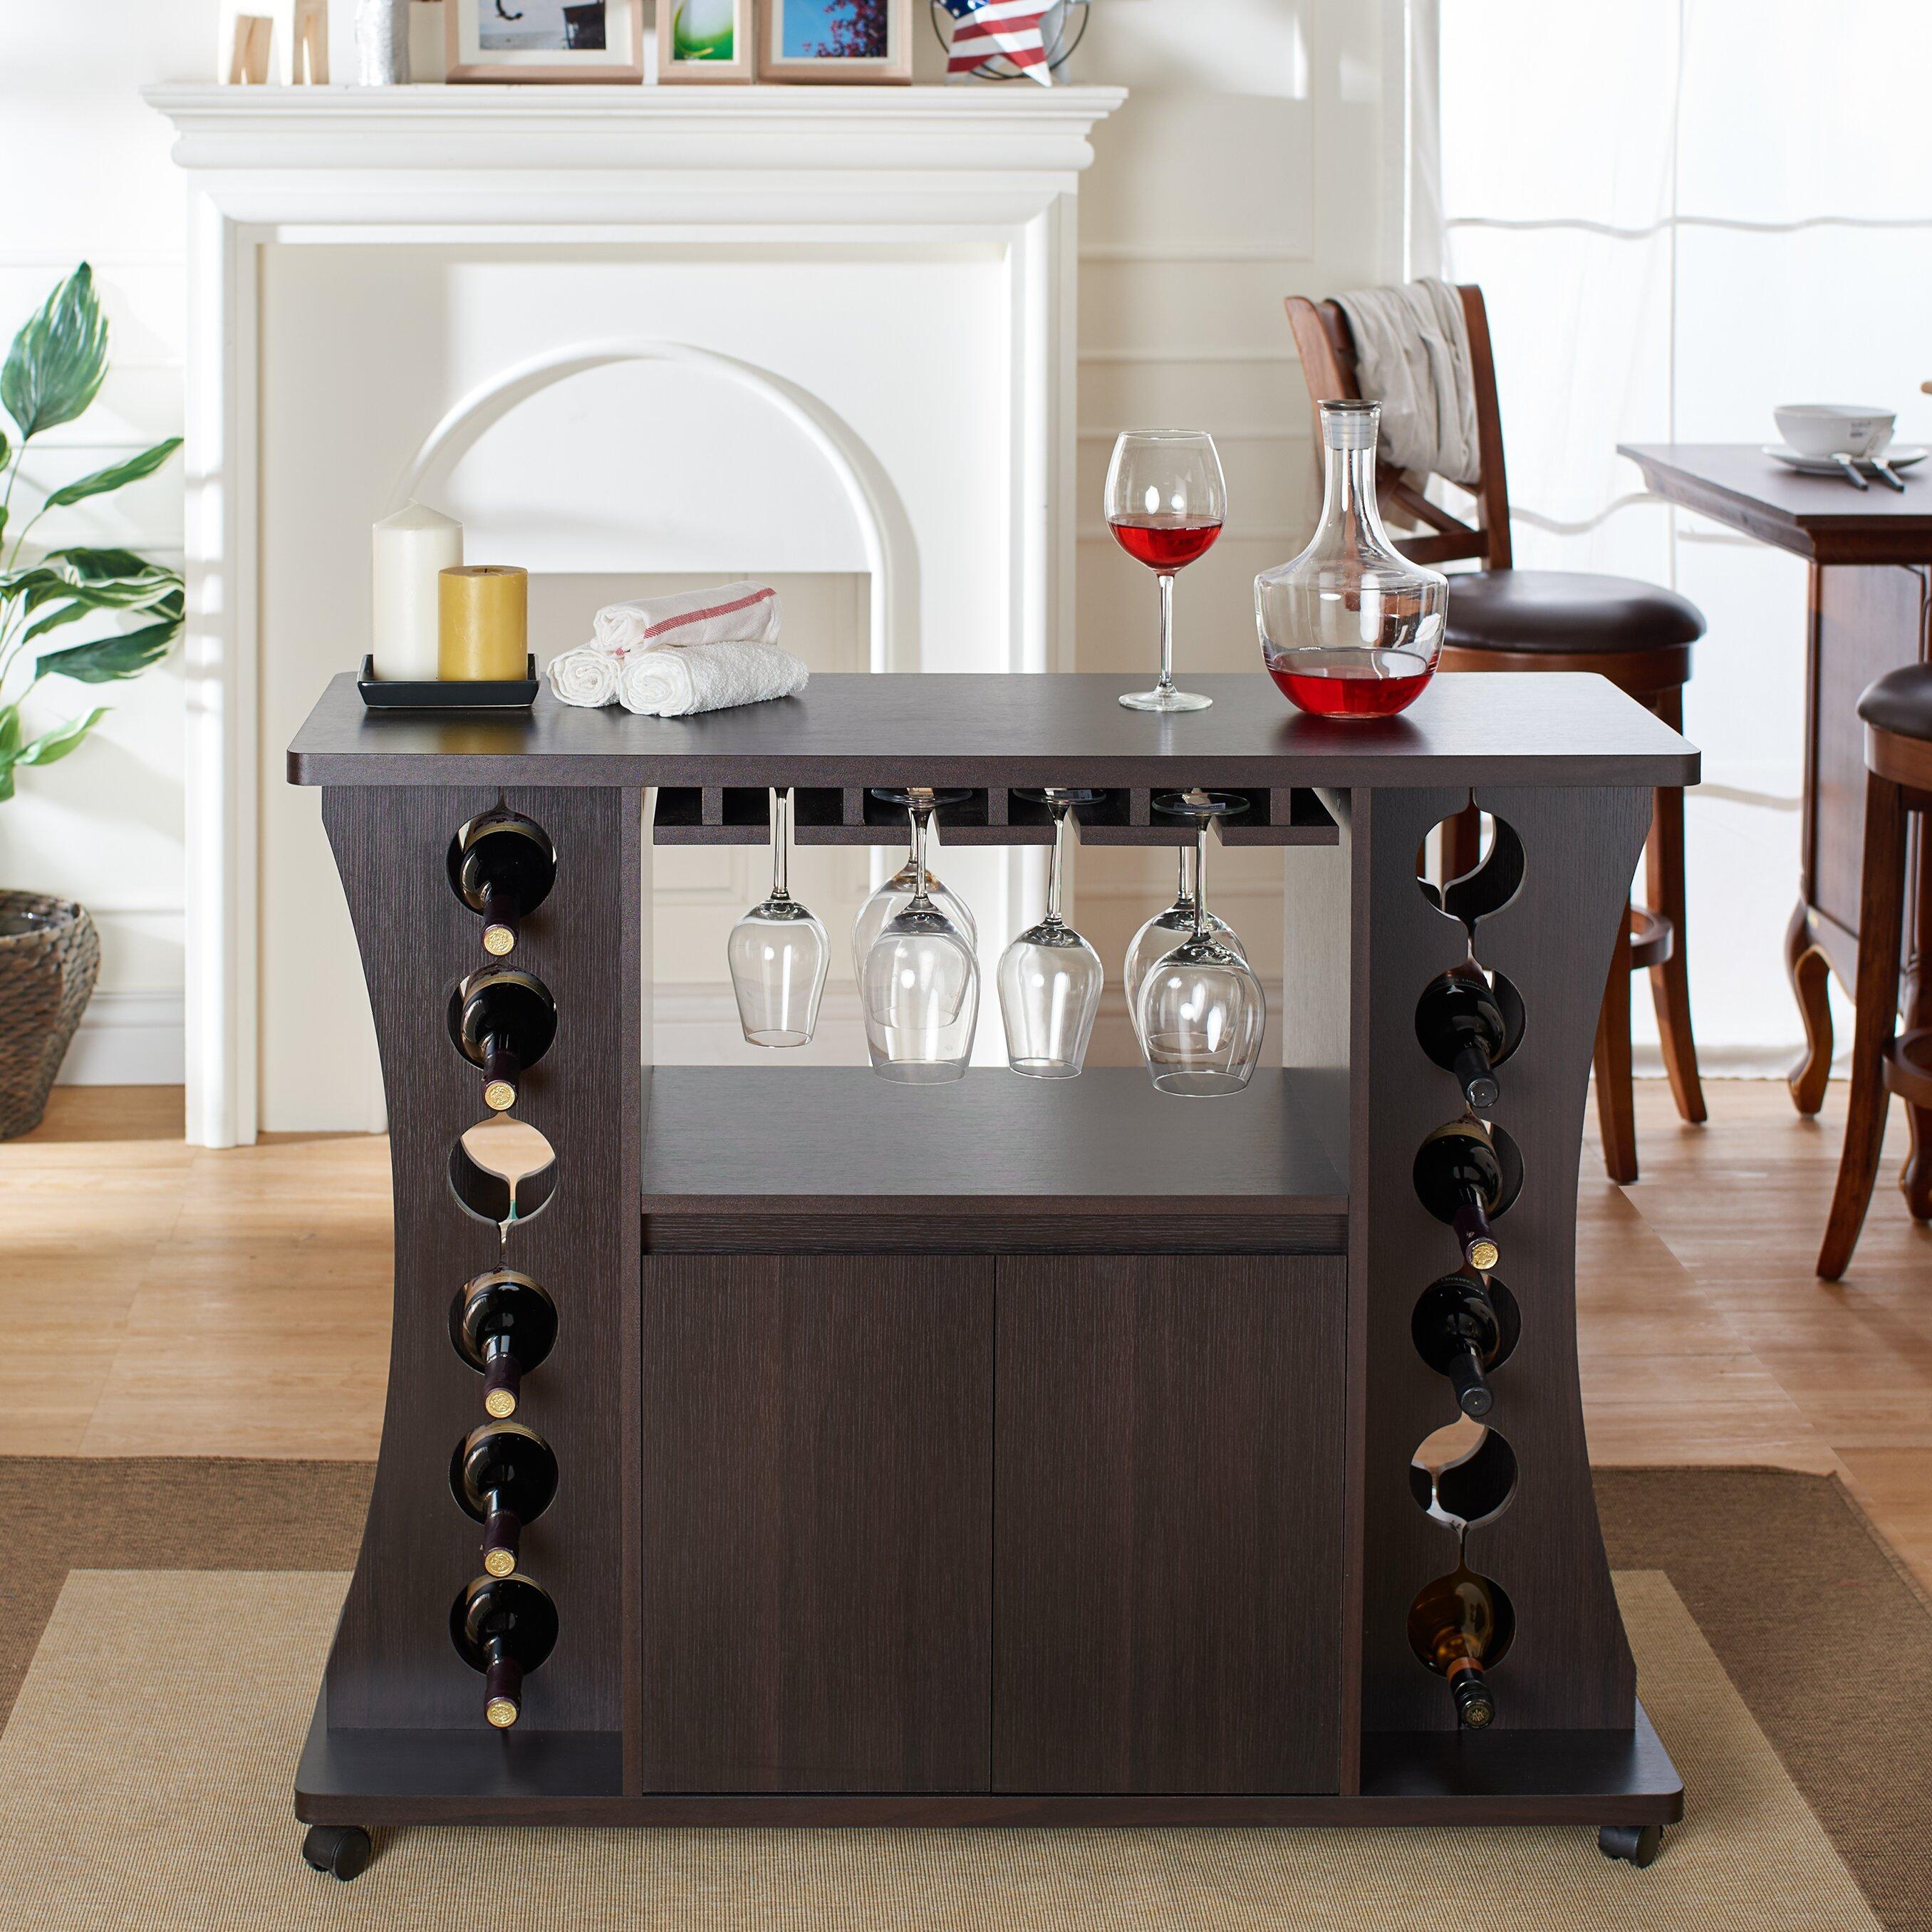 Hokku Designs Cordelia 12 Bottle Wine Bar & Reviews